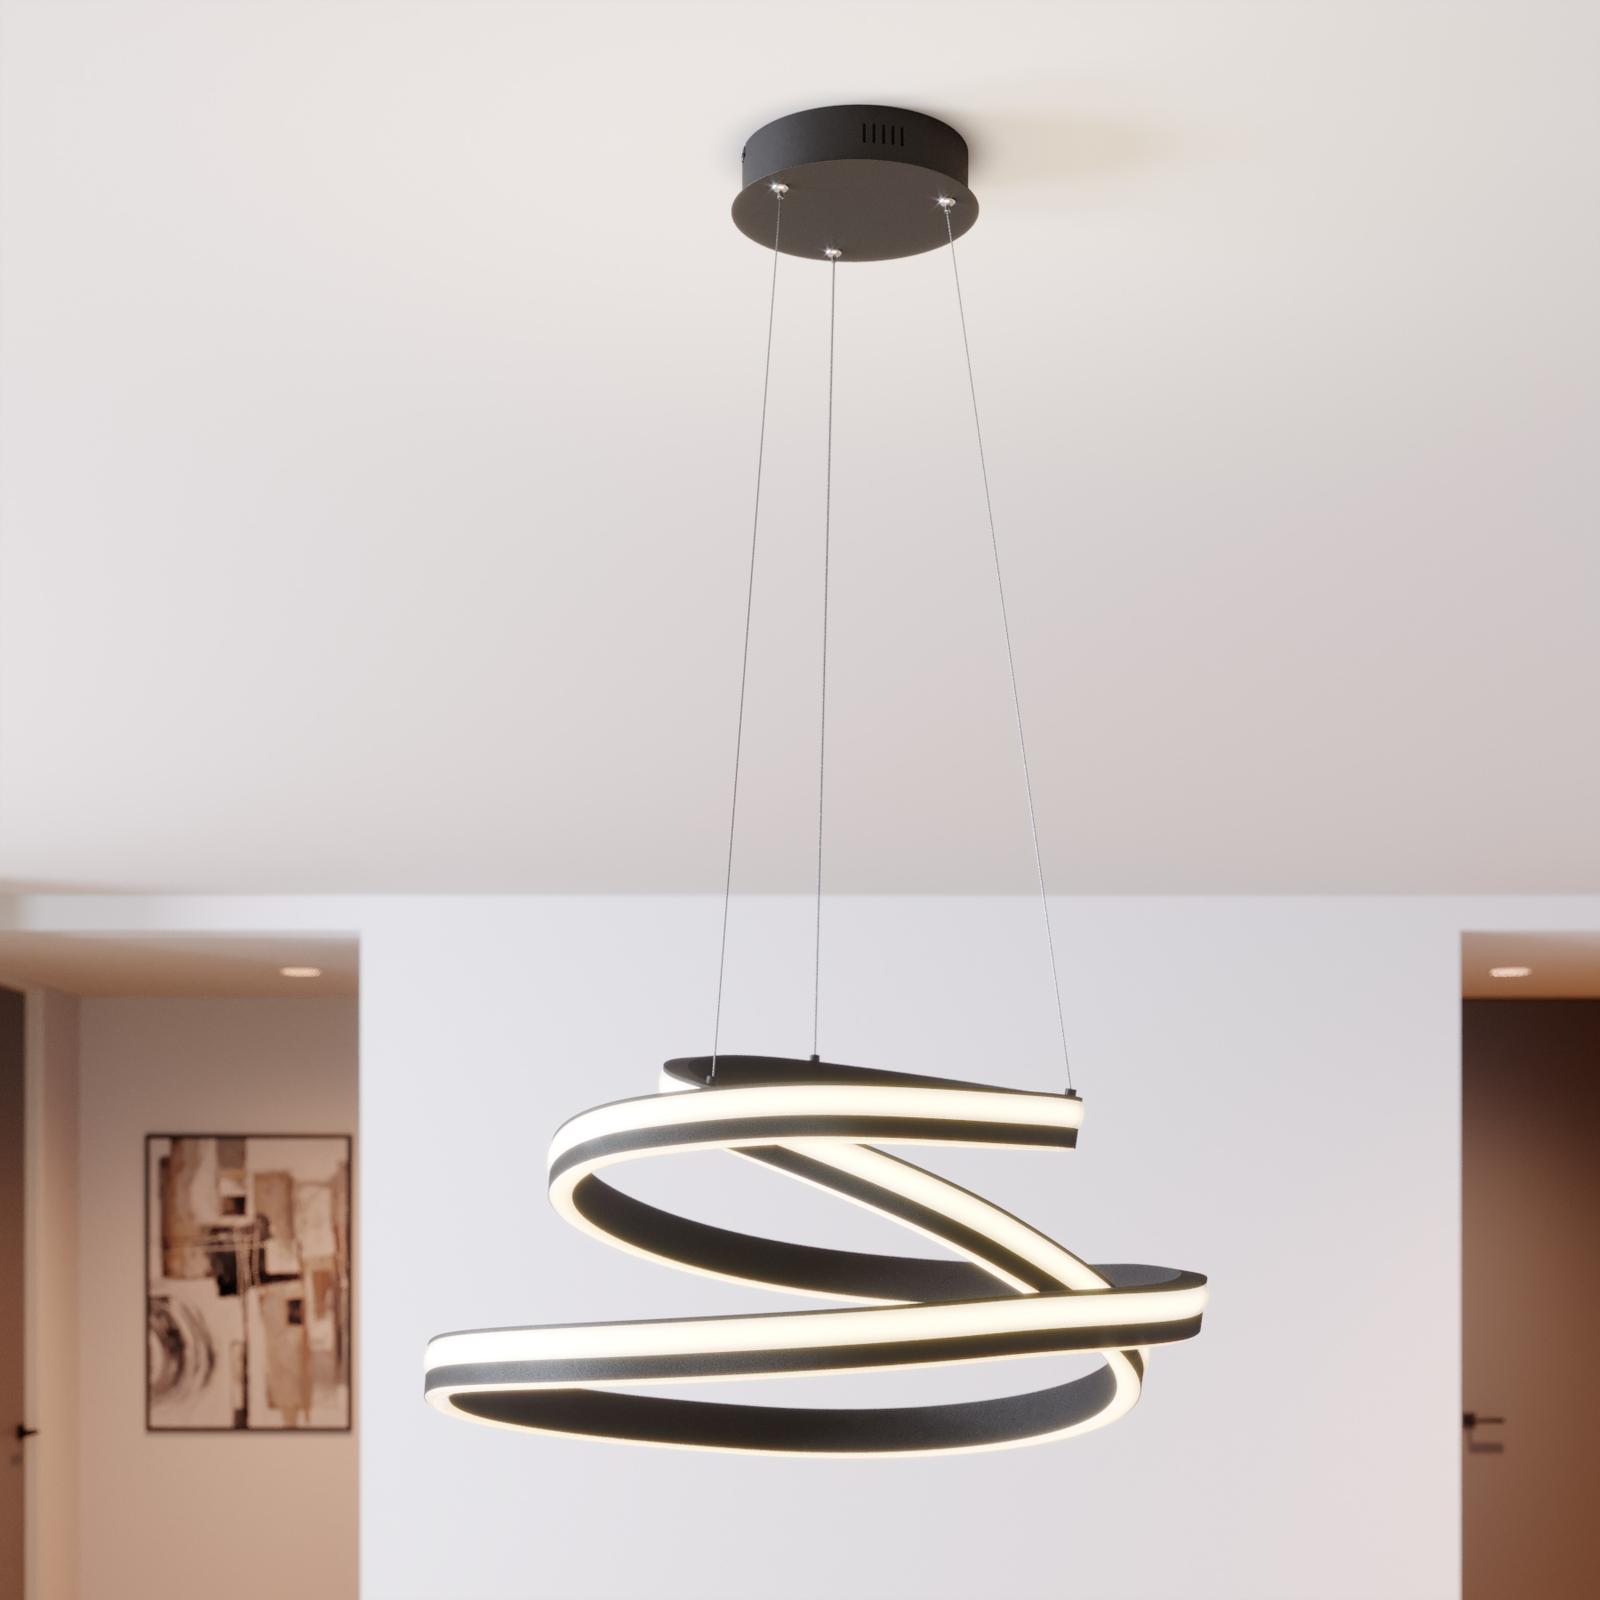 Lucande Emlyn LED-pendellampe, 60 cm